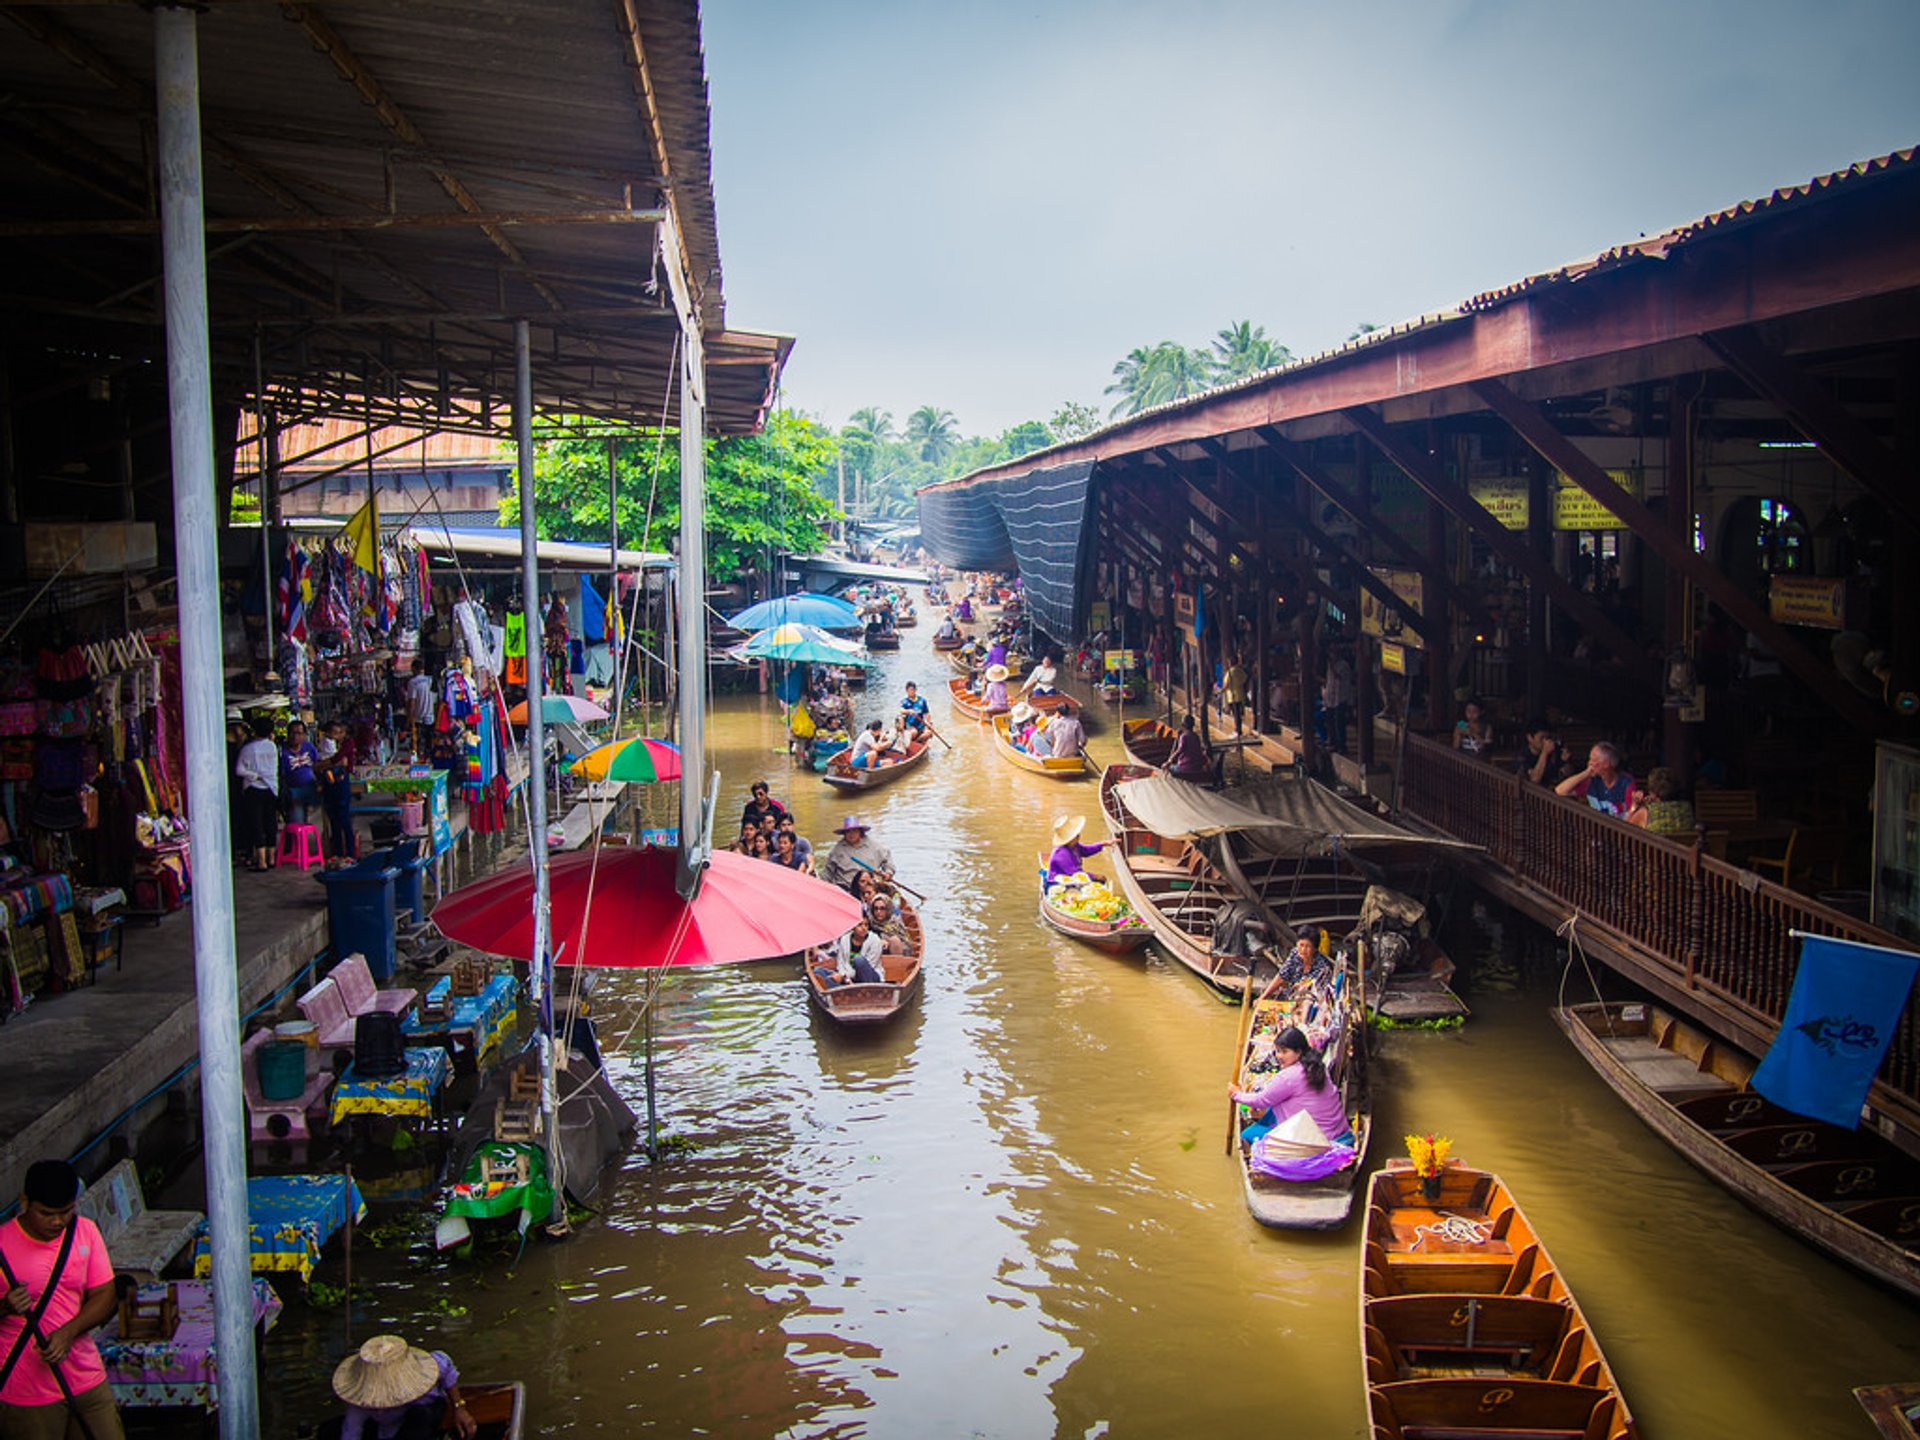 Damnoen Saduak floating market 2020